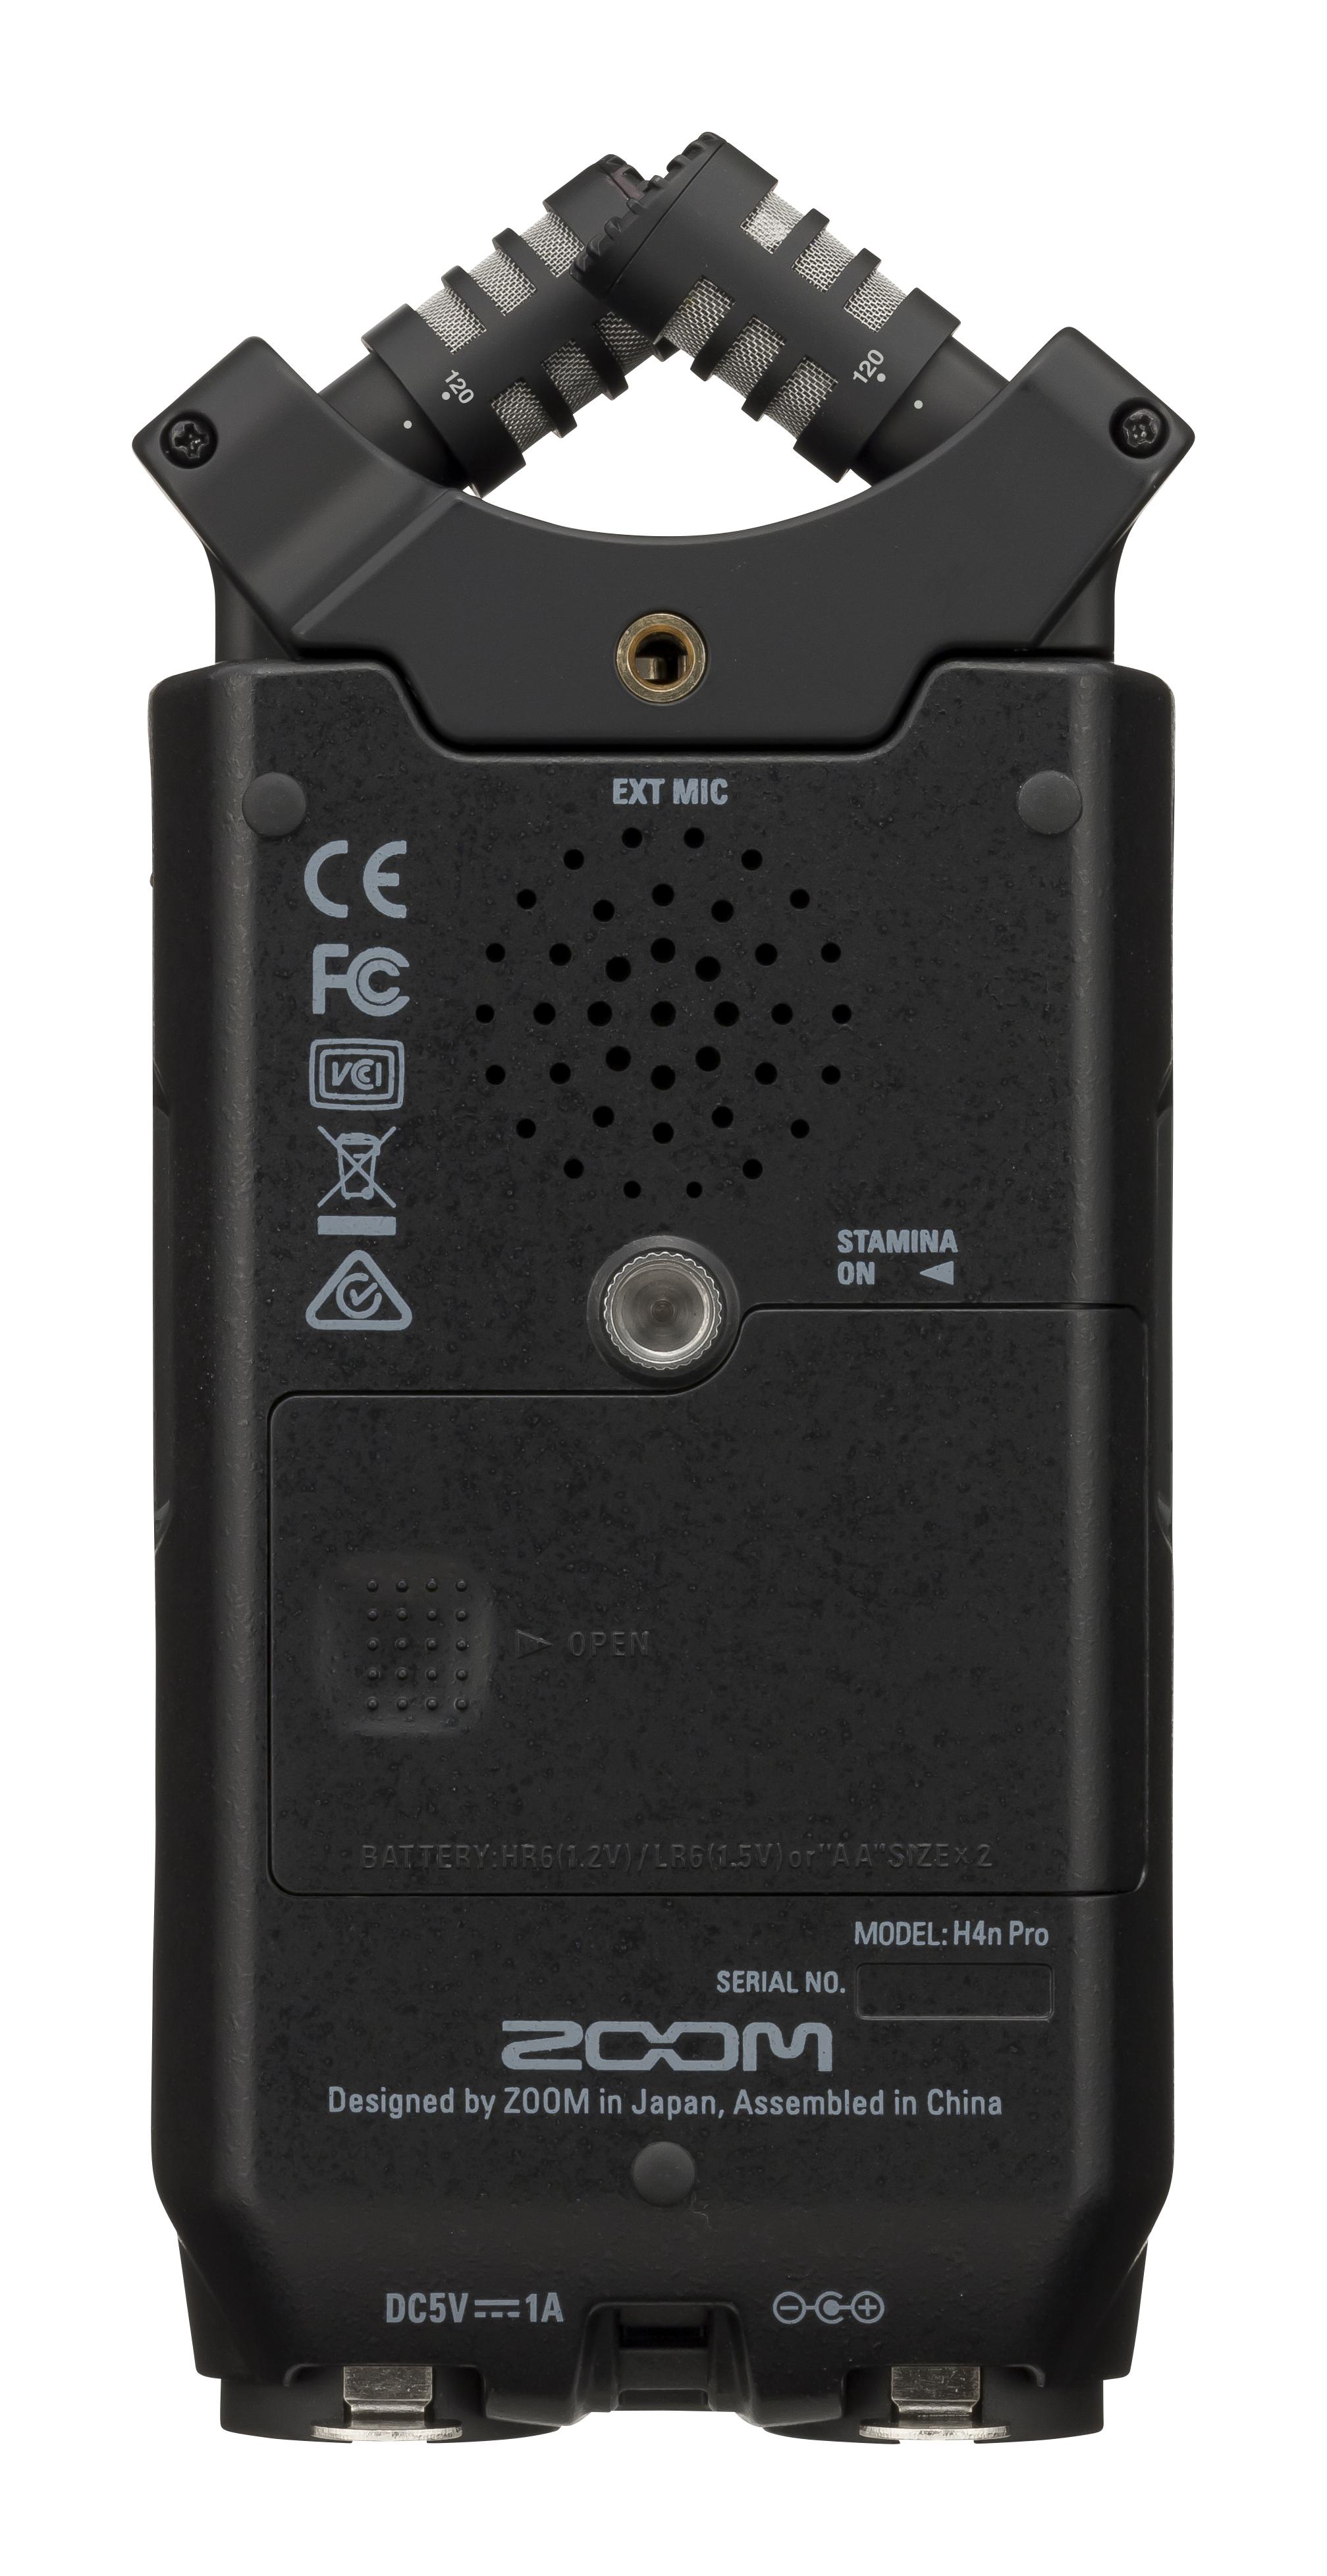 Zoom H4n Pro Black Portable Recorder